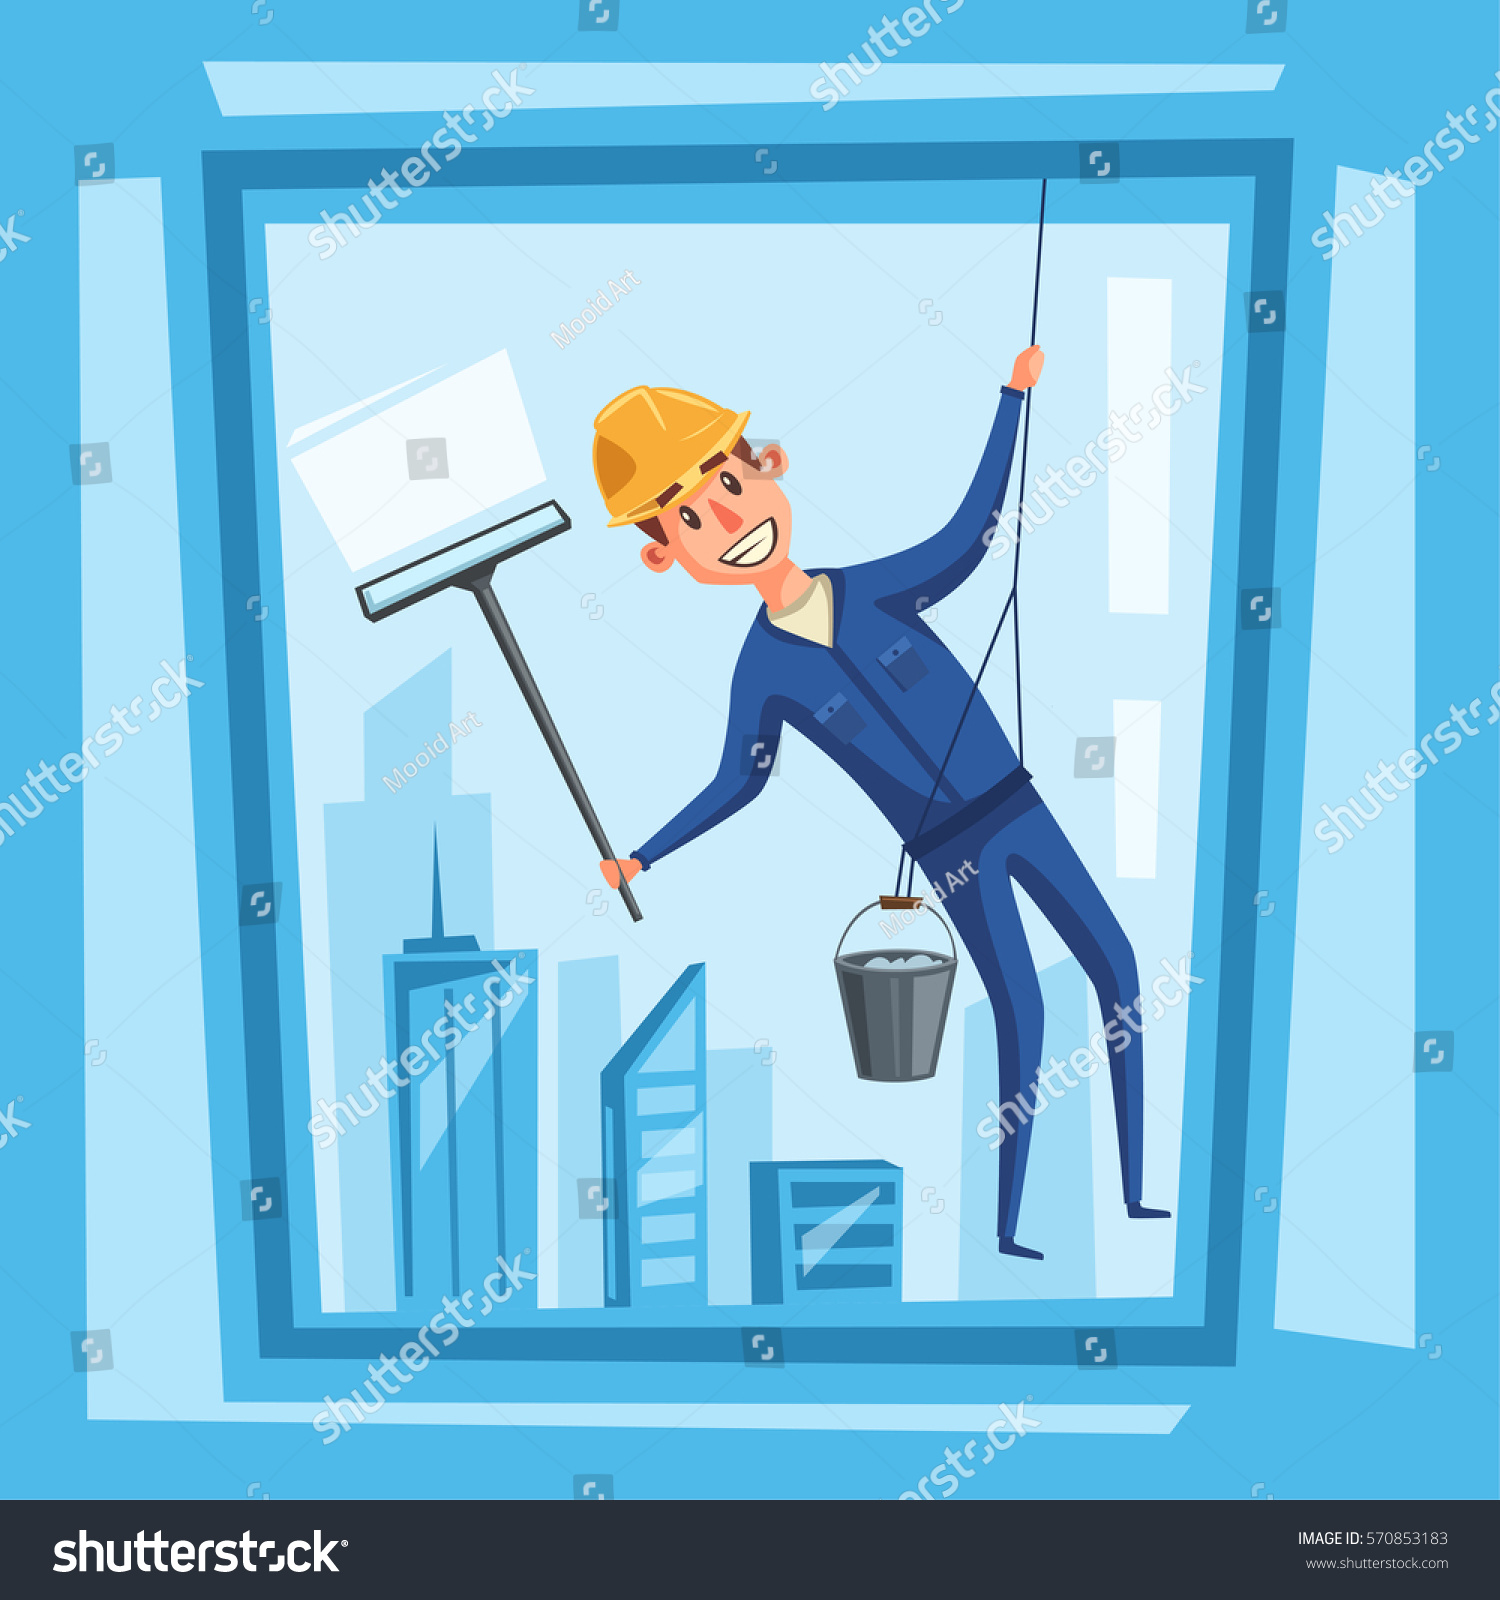 profesional worker cleaning windows cartoon vector stock vector 570853183 shutterstock. Black Bedroom Furniture Sets. Home Design Ideas